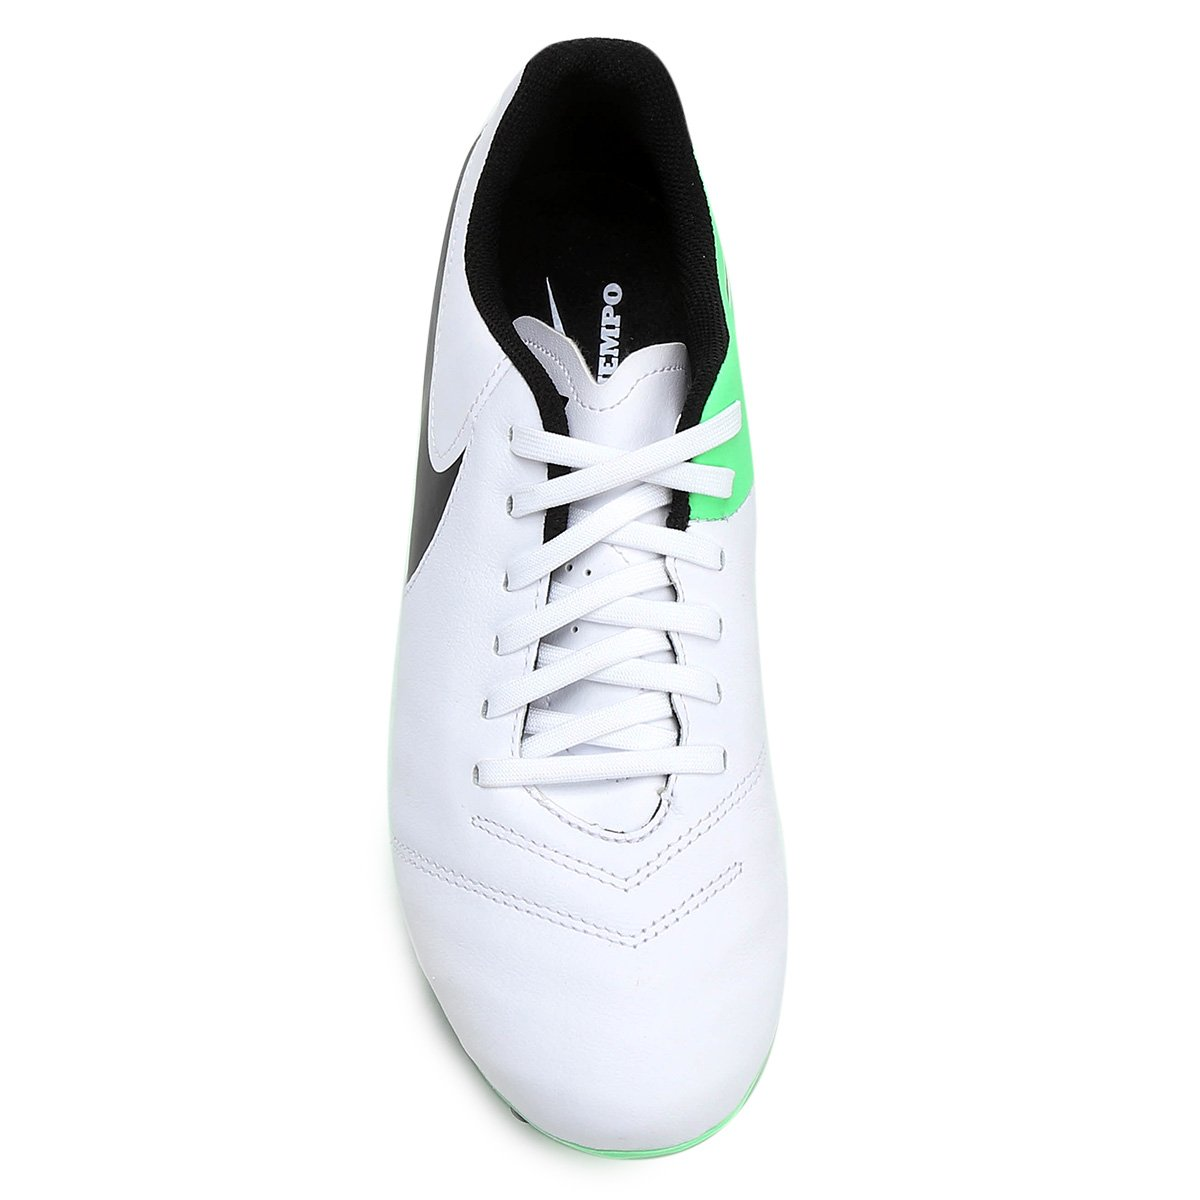 Chuteira Campo Nike Tiempo Genio 2 Leather FG - Compre Agora  42dc8d7234f69